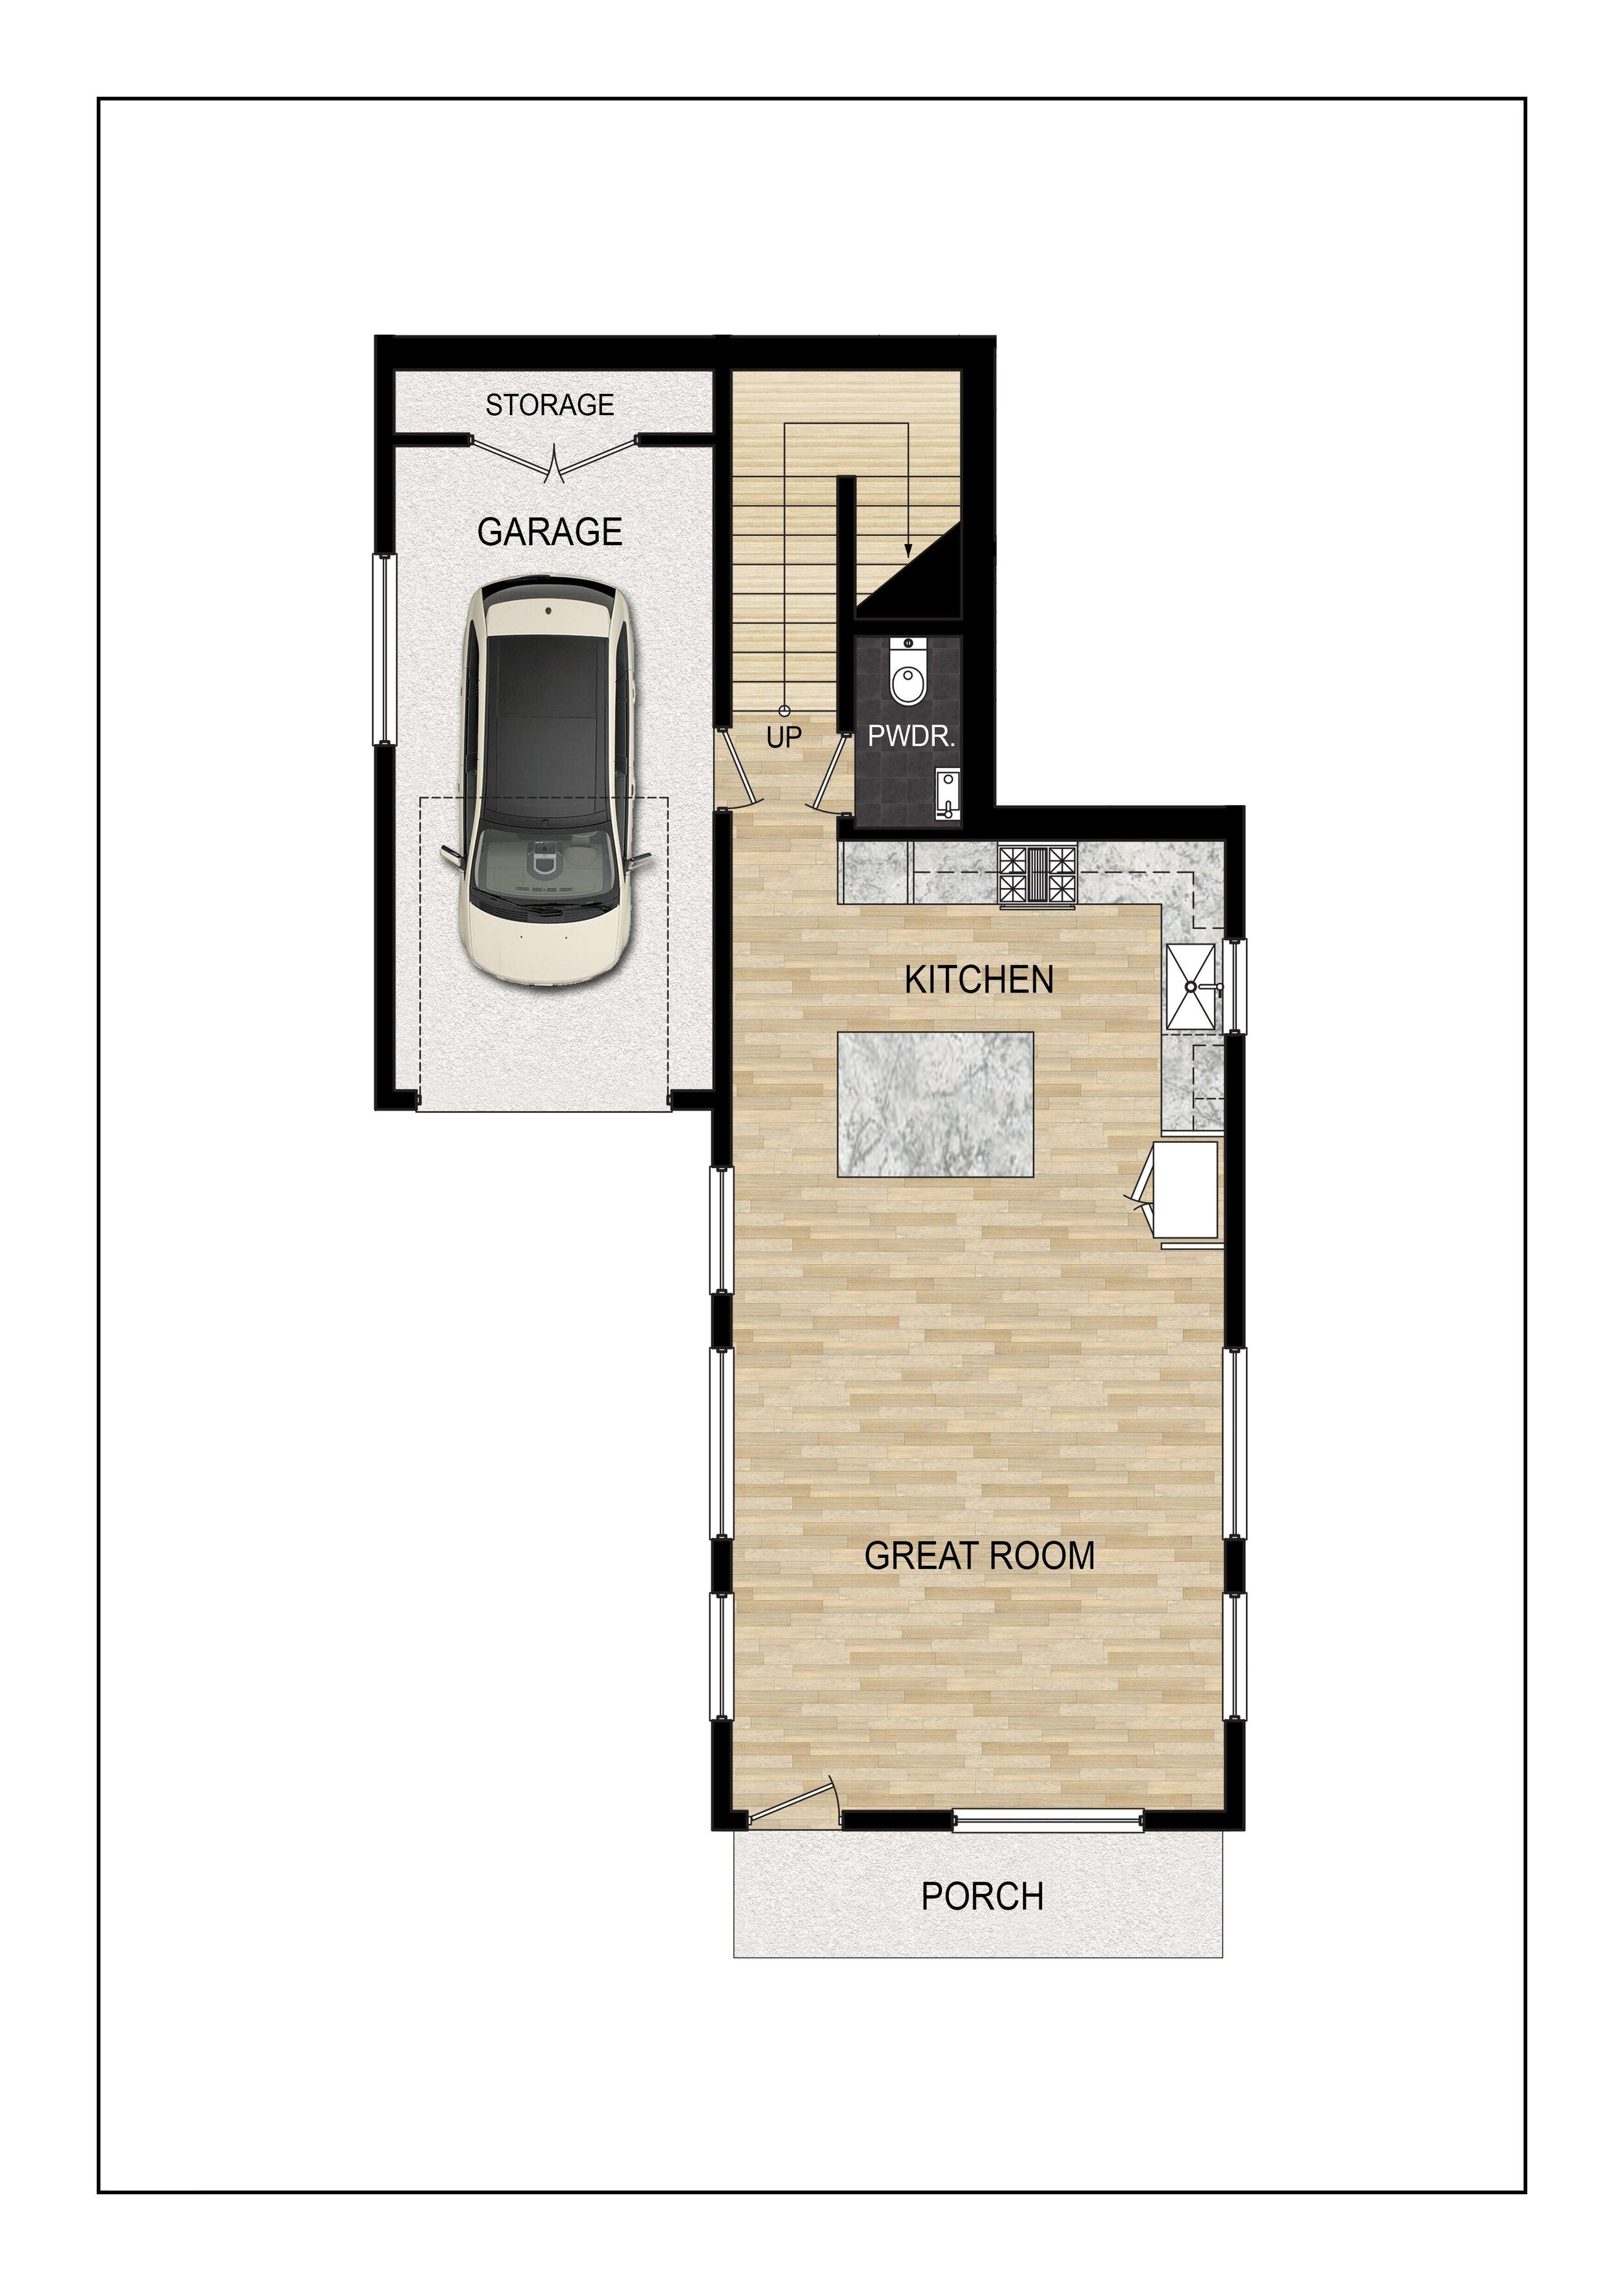 4614-gillis-78745-floorplan